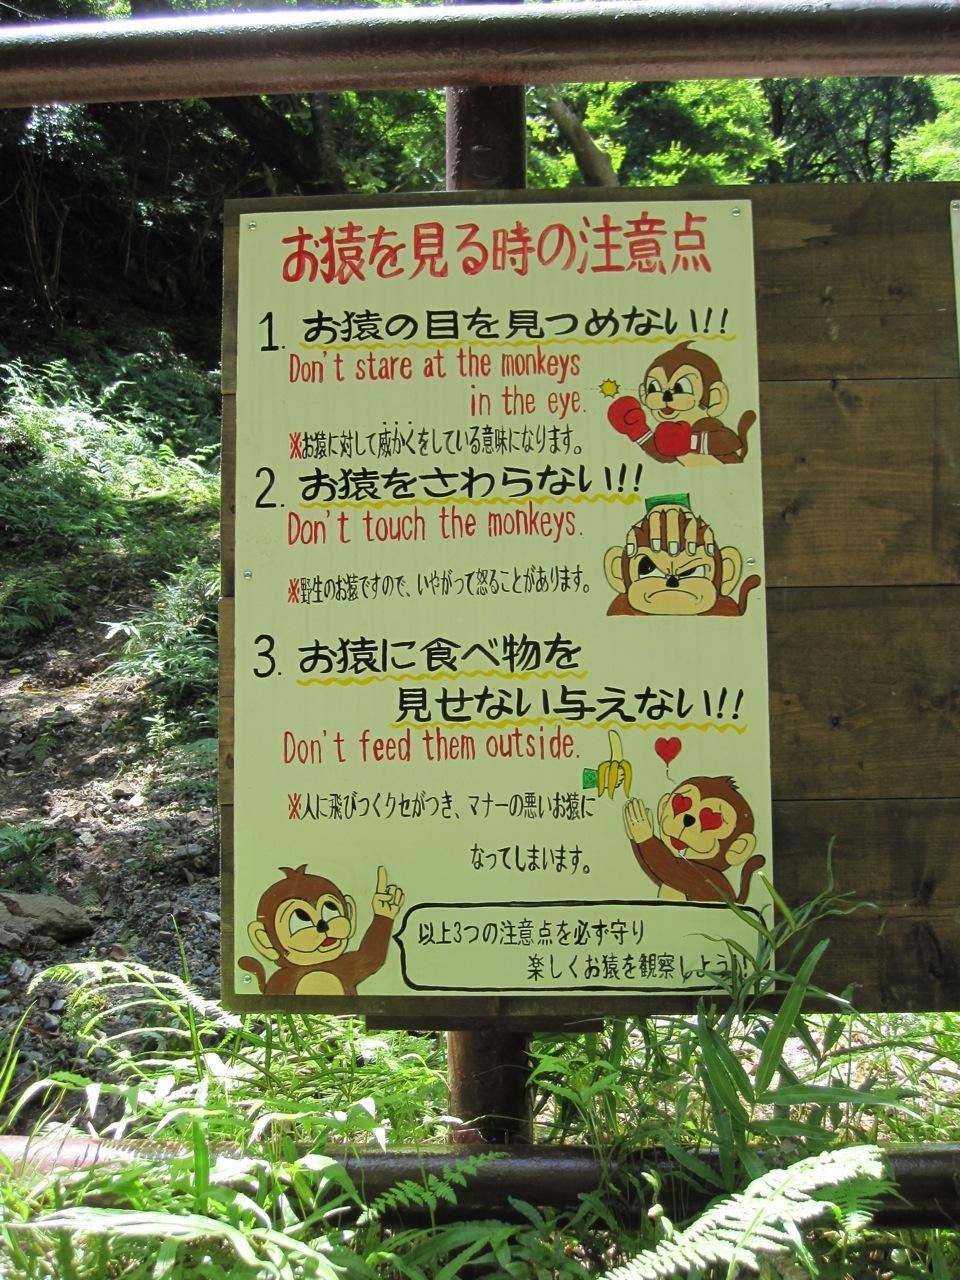 how to go to arashiyama monkey park